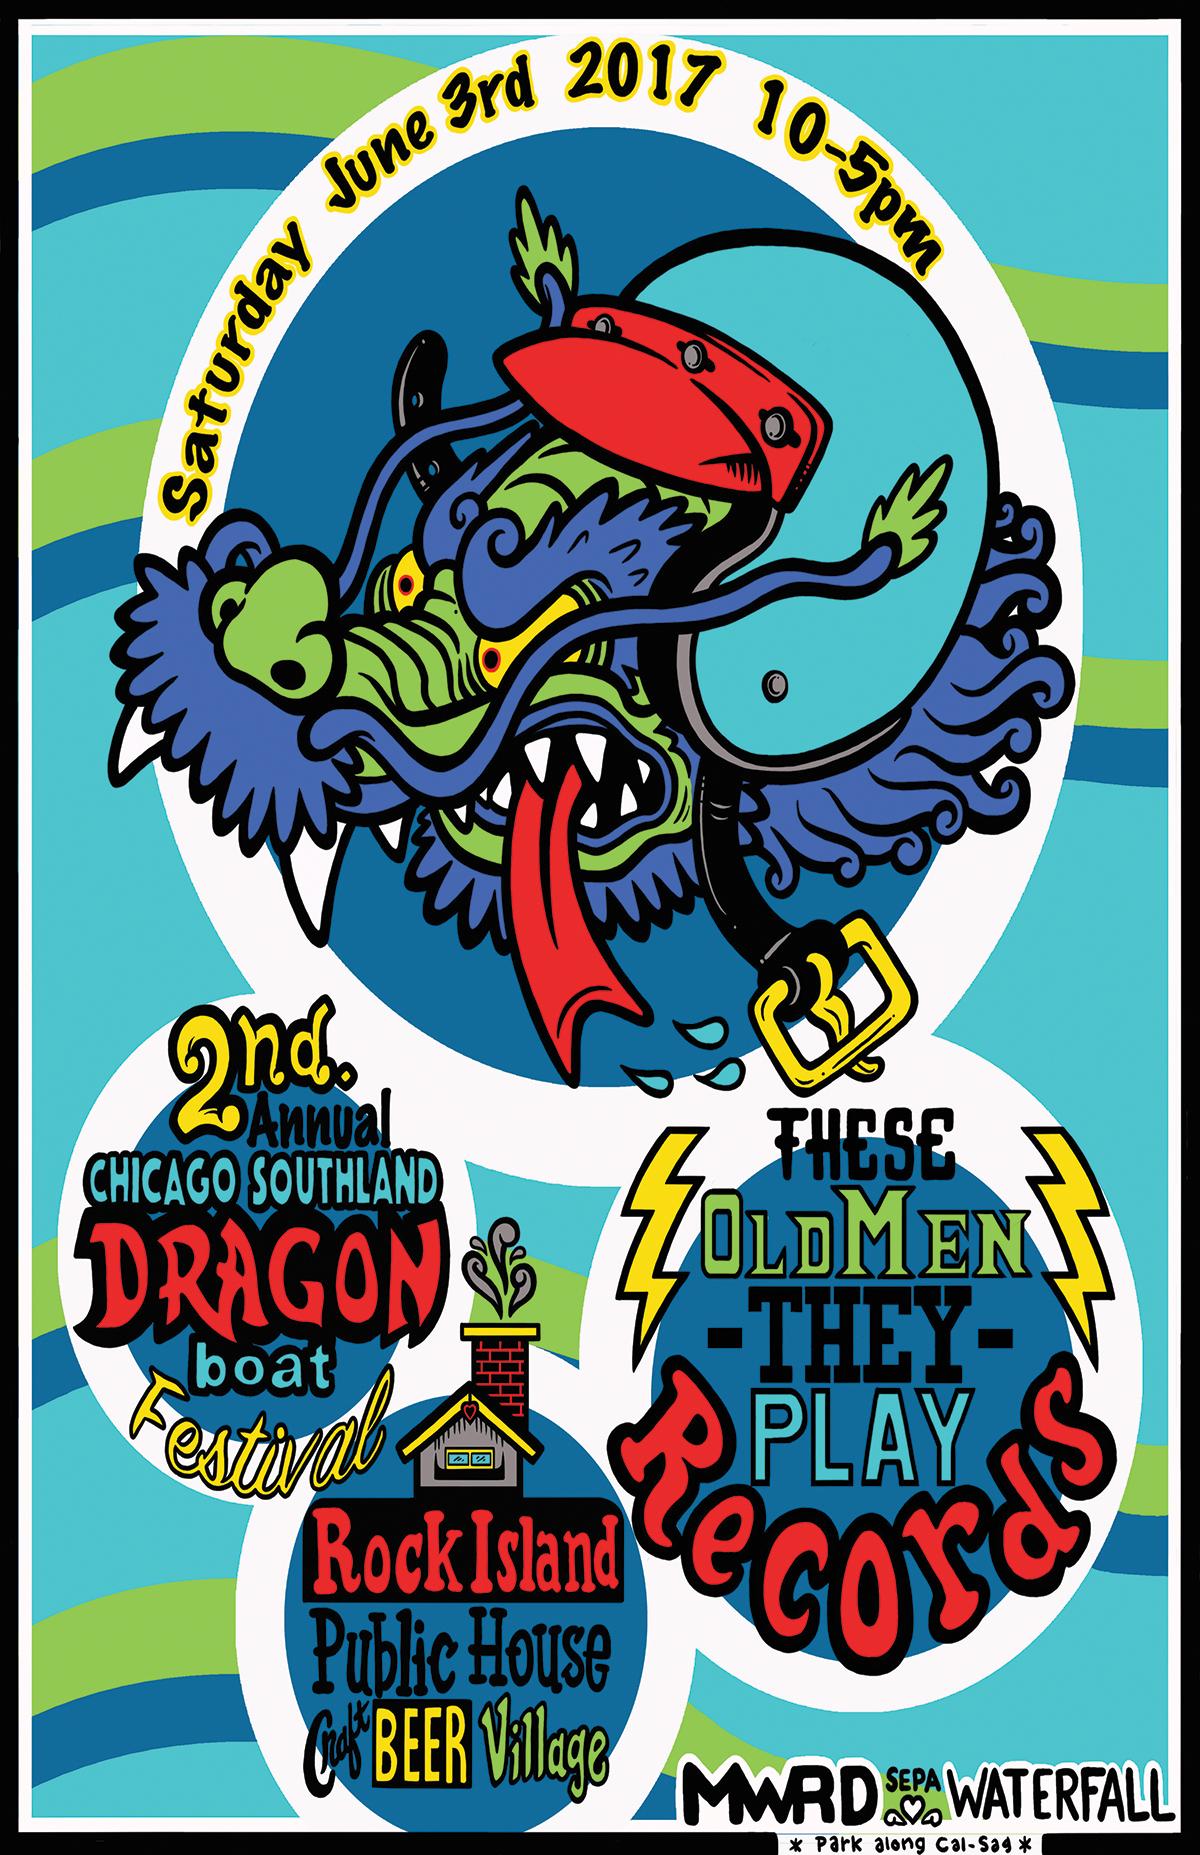 Chicago Southland DragonBoat Festival